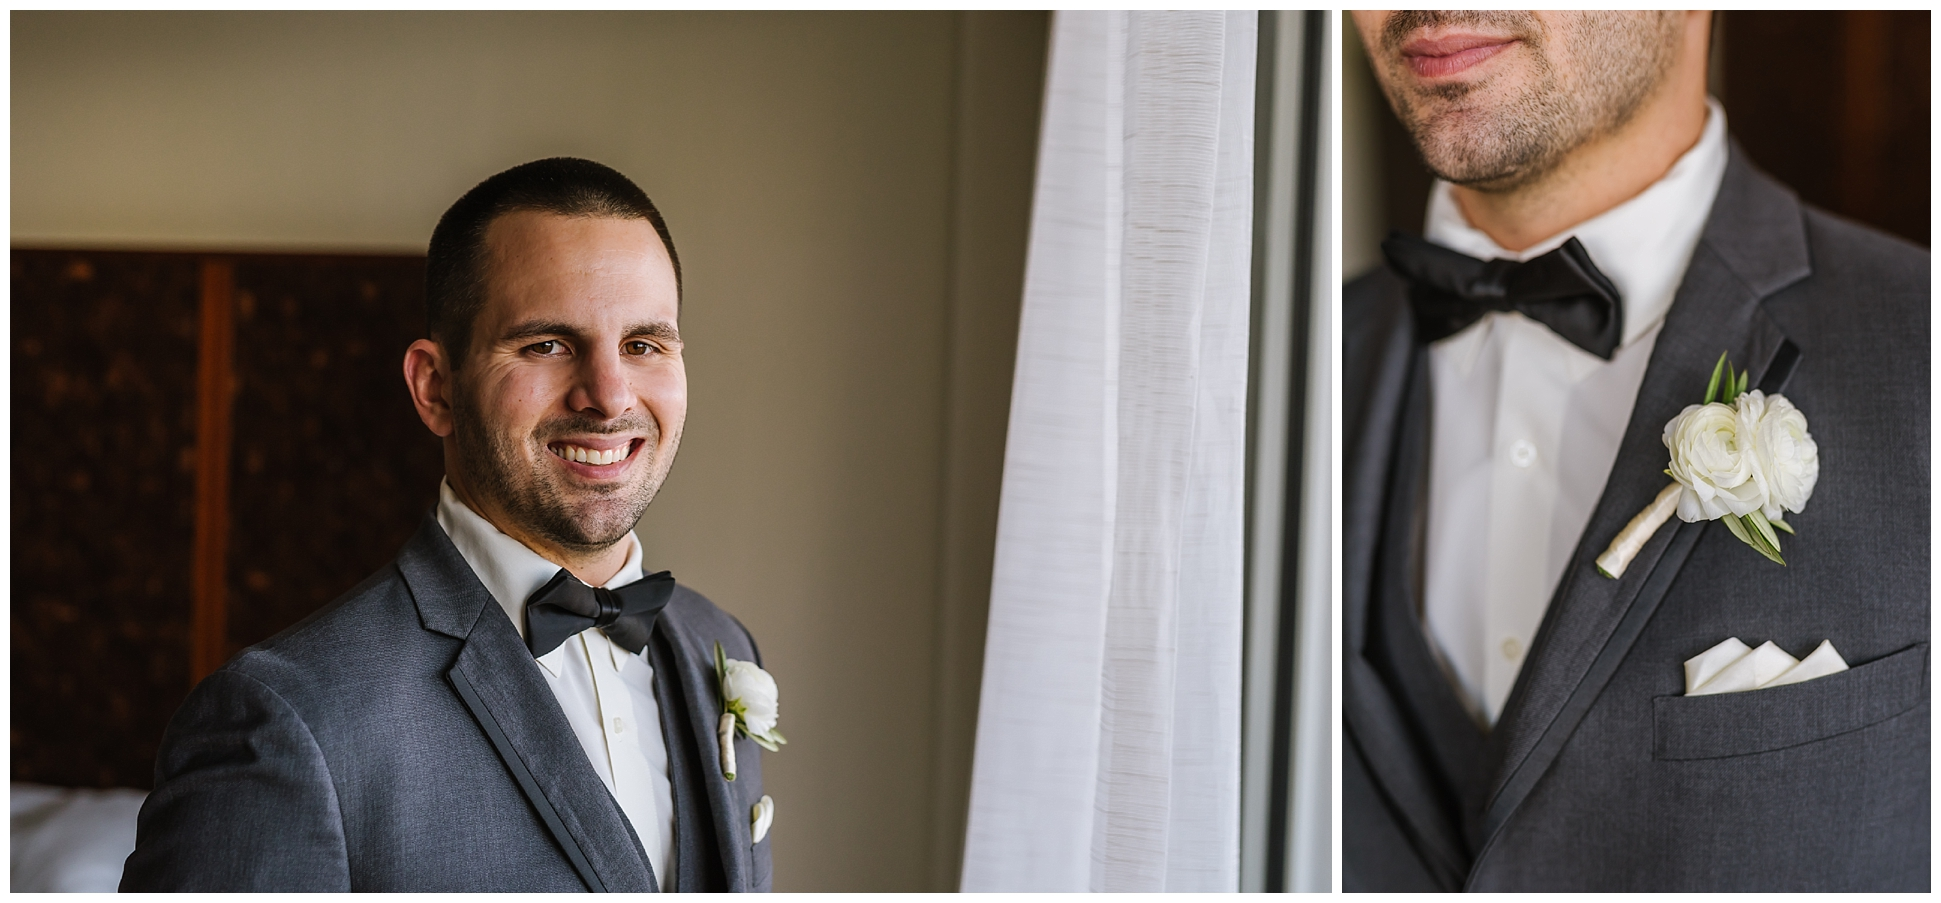 Sarasota-wedding-photographer-hyatt-regency-blush_0024.jpg